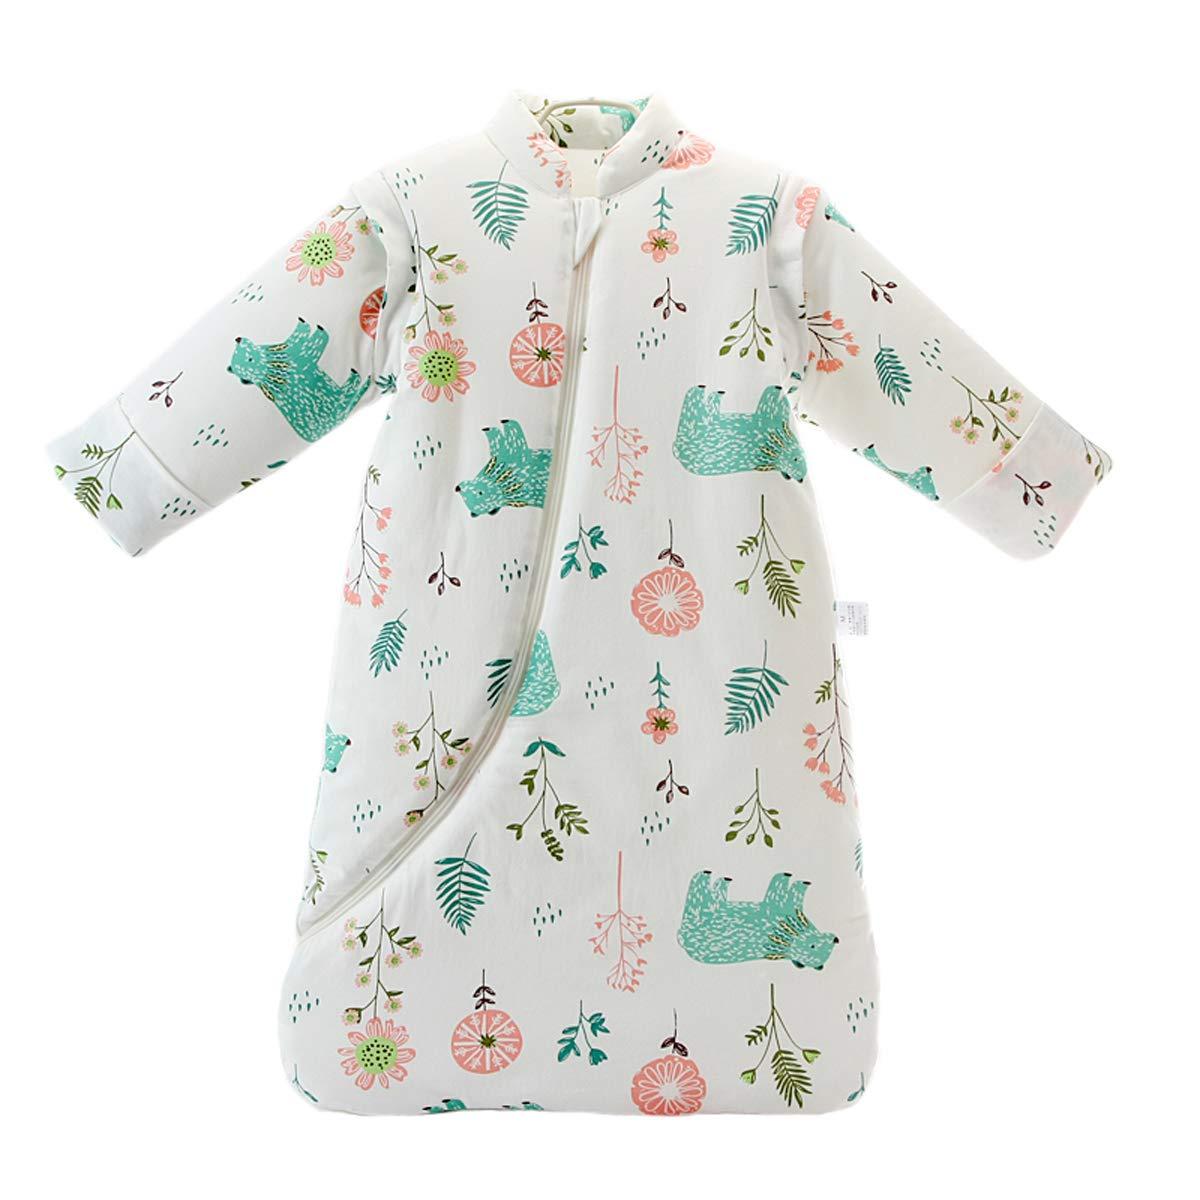 ae4af4385e36 Baby Winter Sleeping Bag Kids Sleeping Bag 3.5 Tog Organic Cotton ...